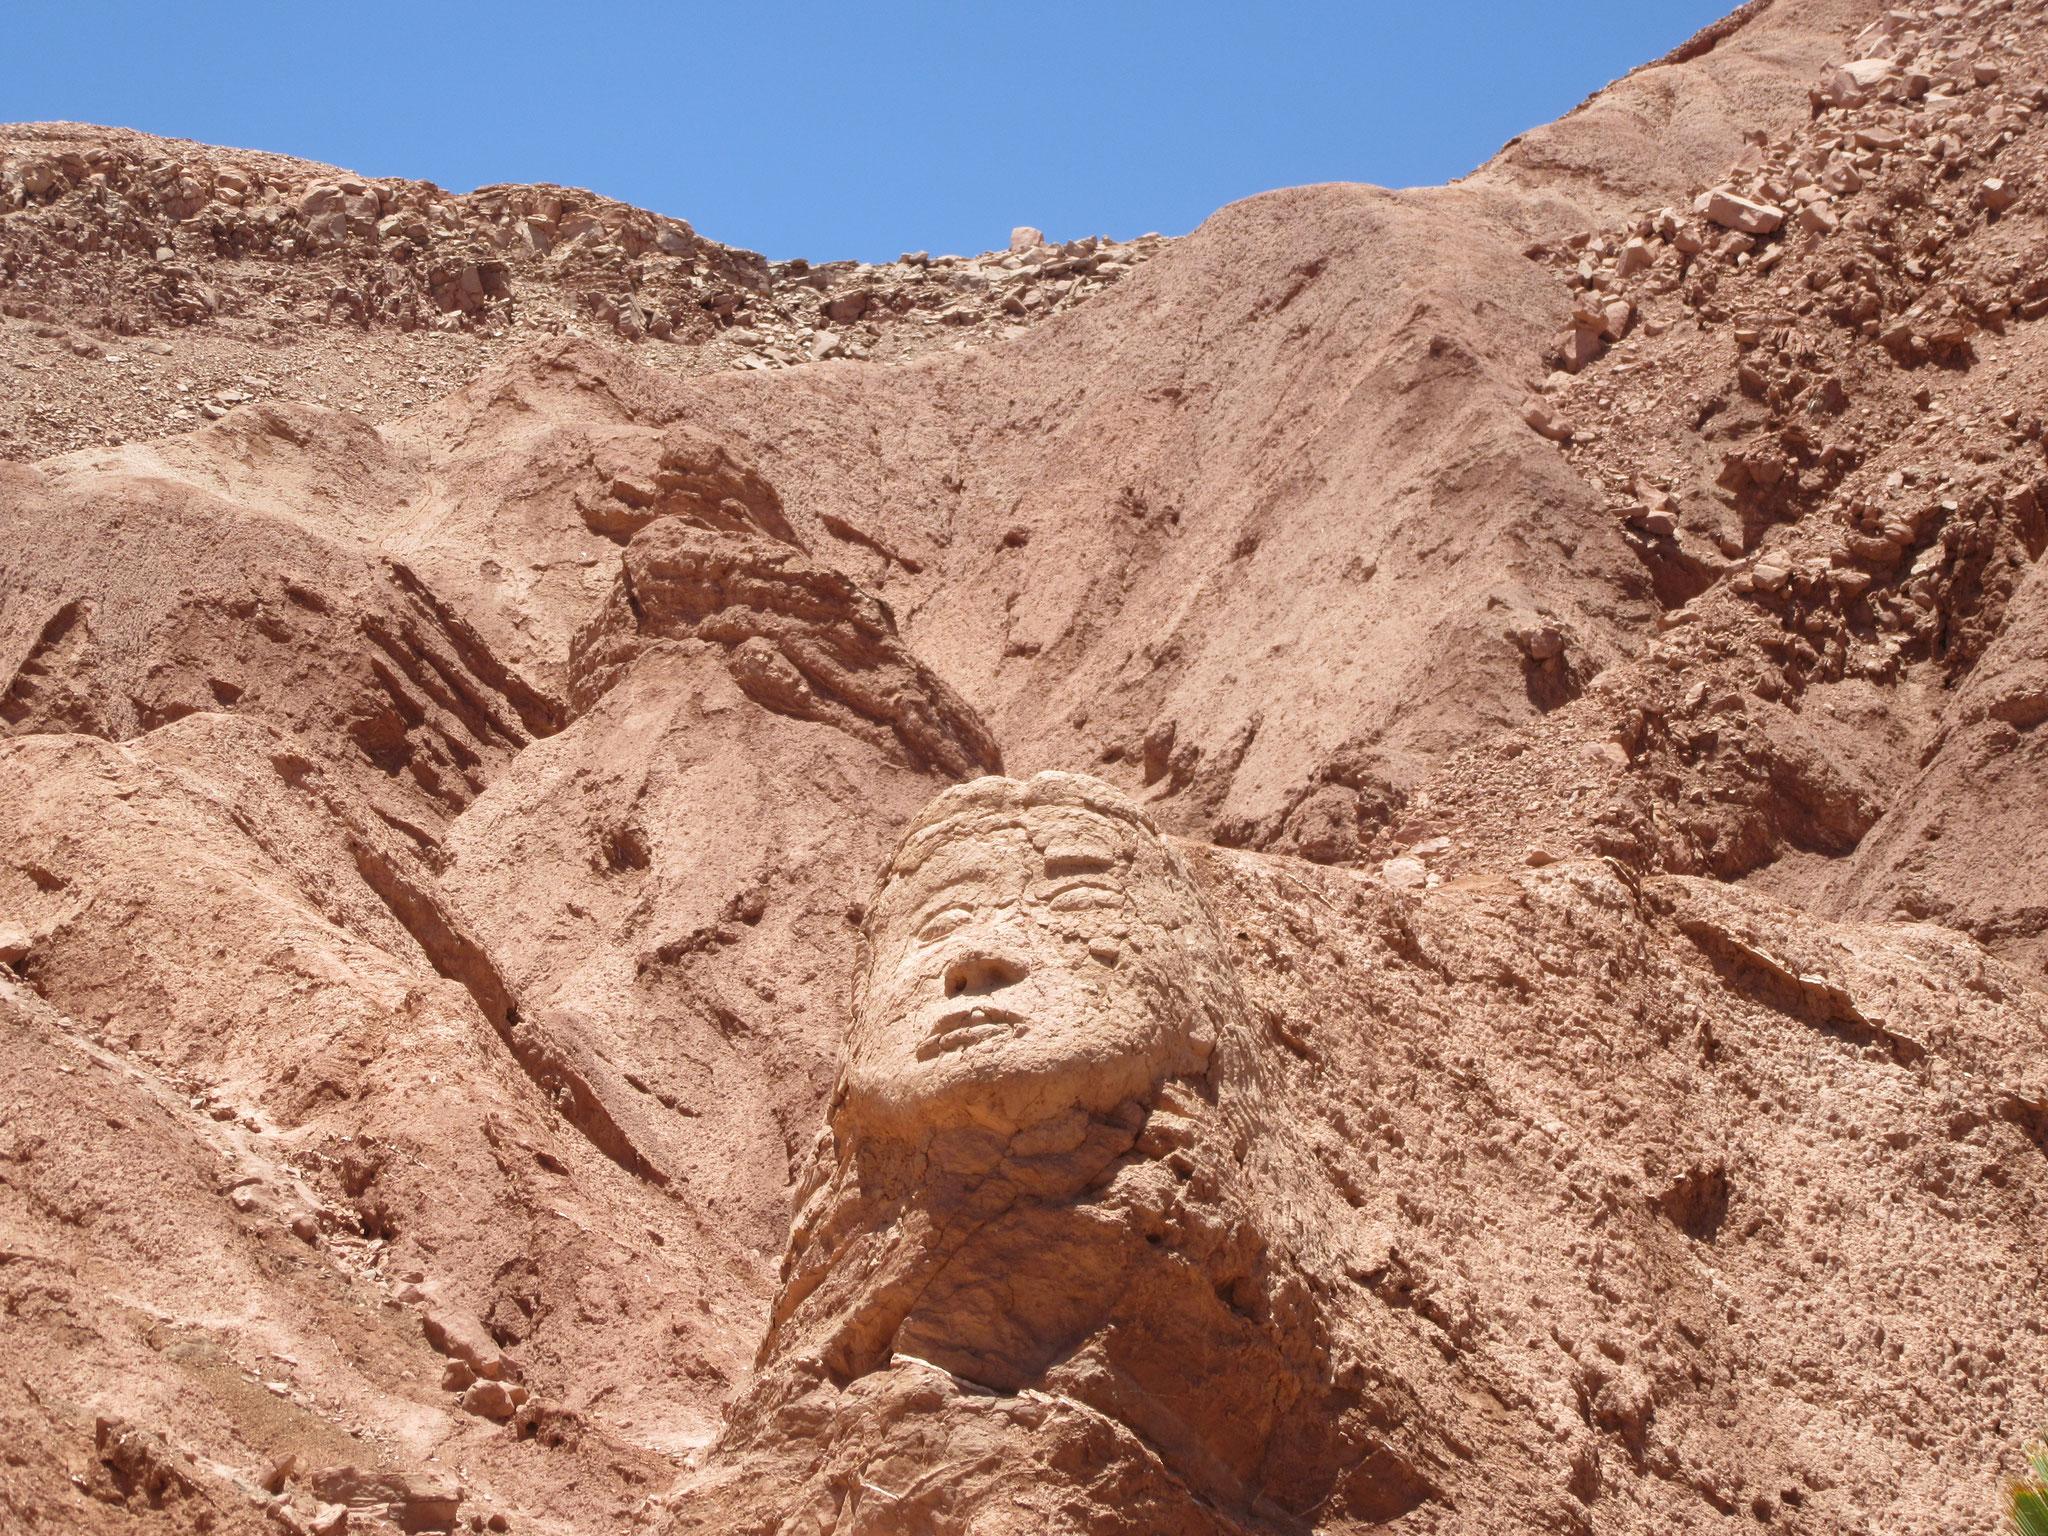 Inka-Stätte Atacamawüste, Chile